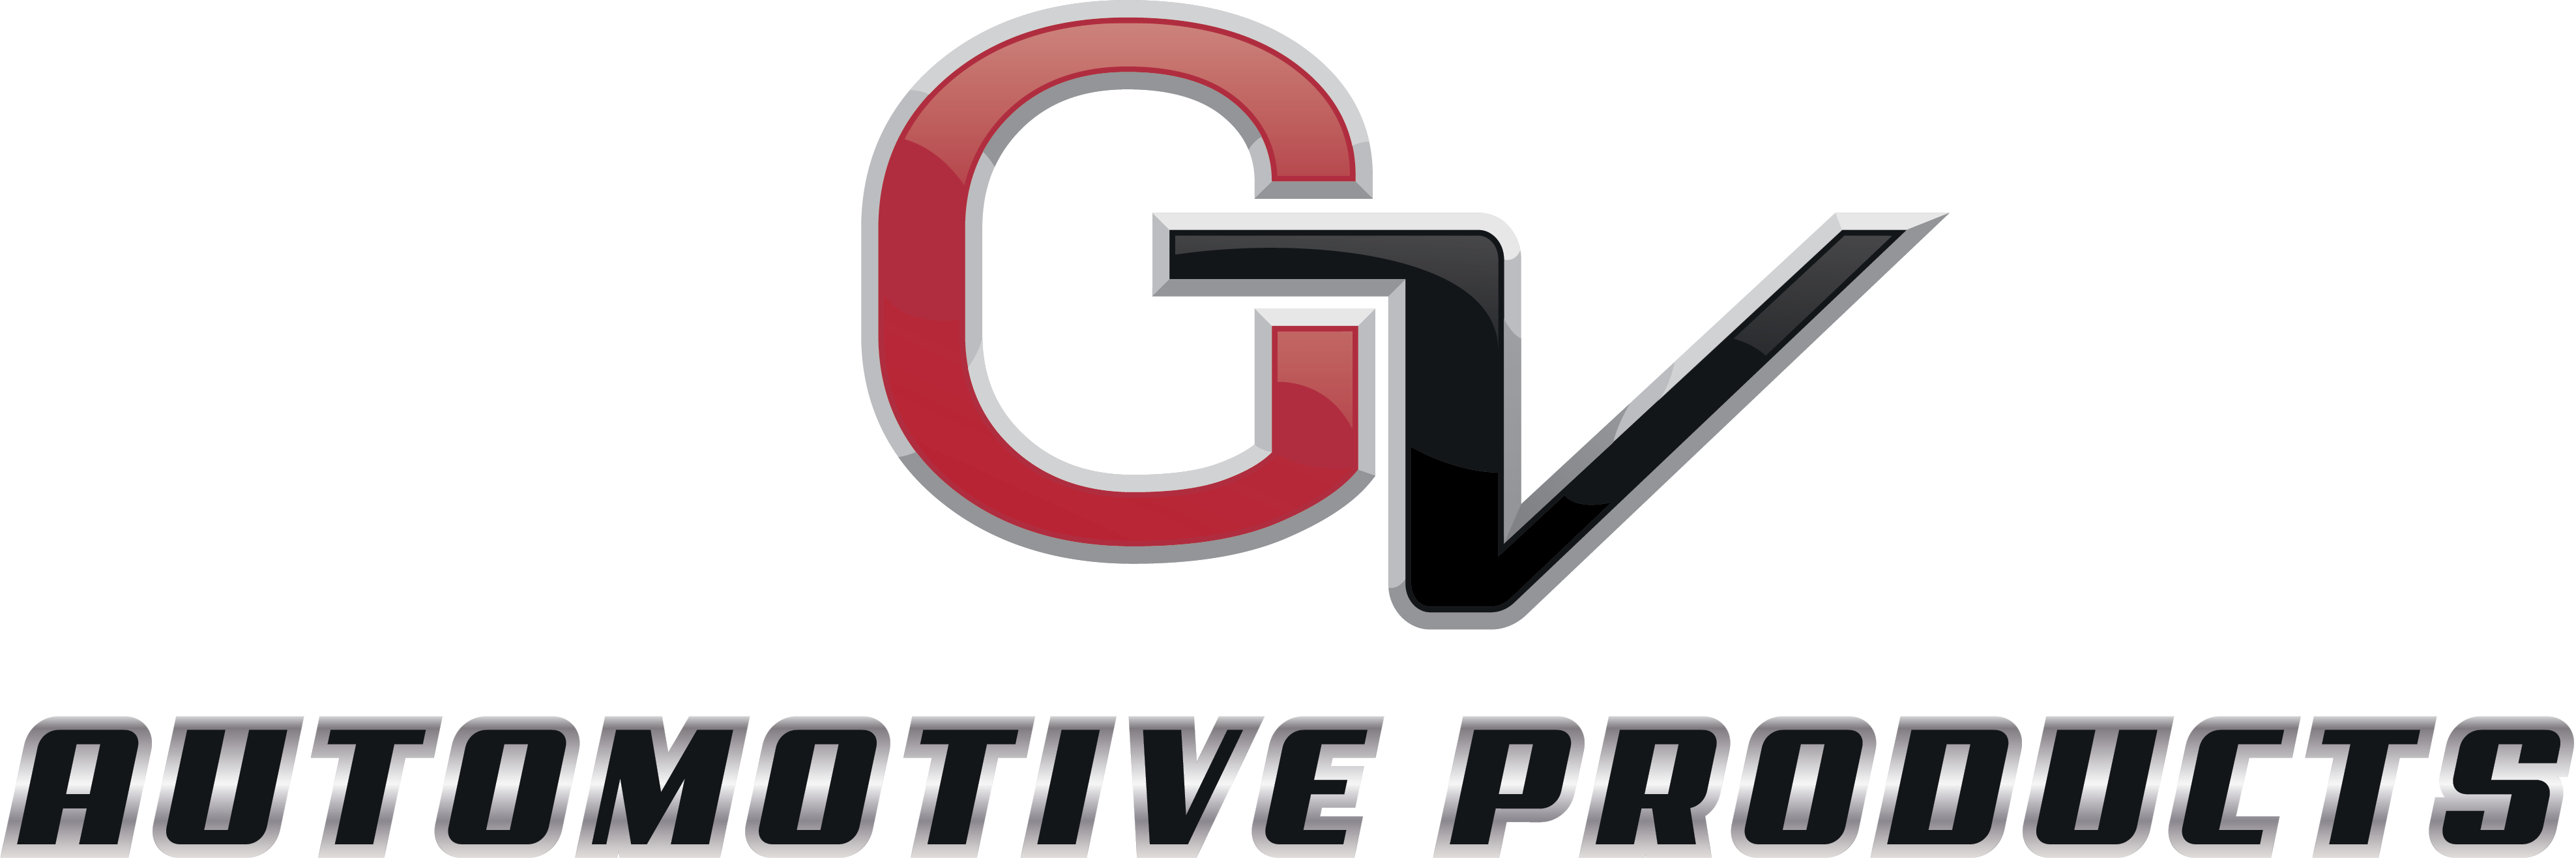 gv automotive products